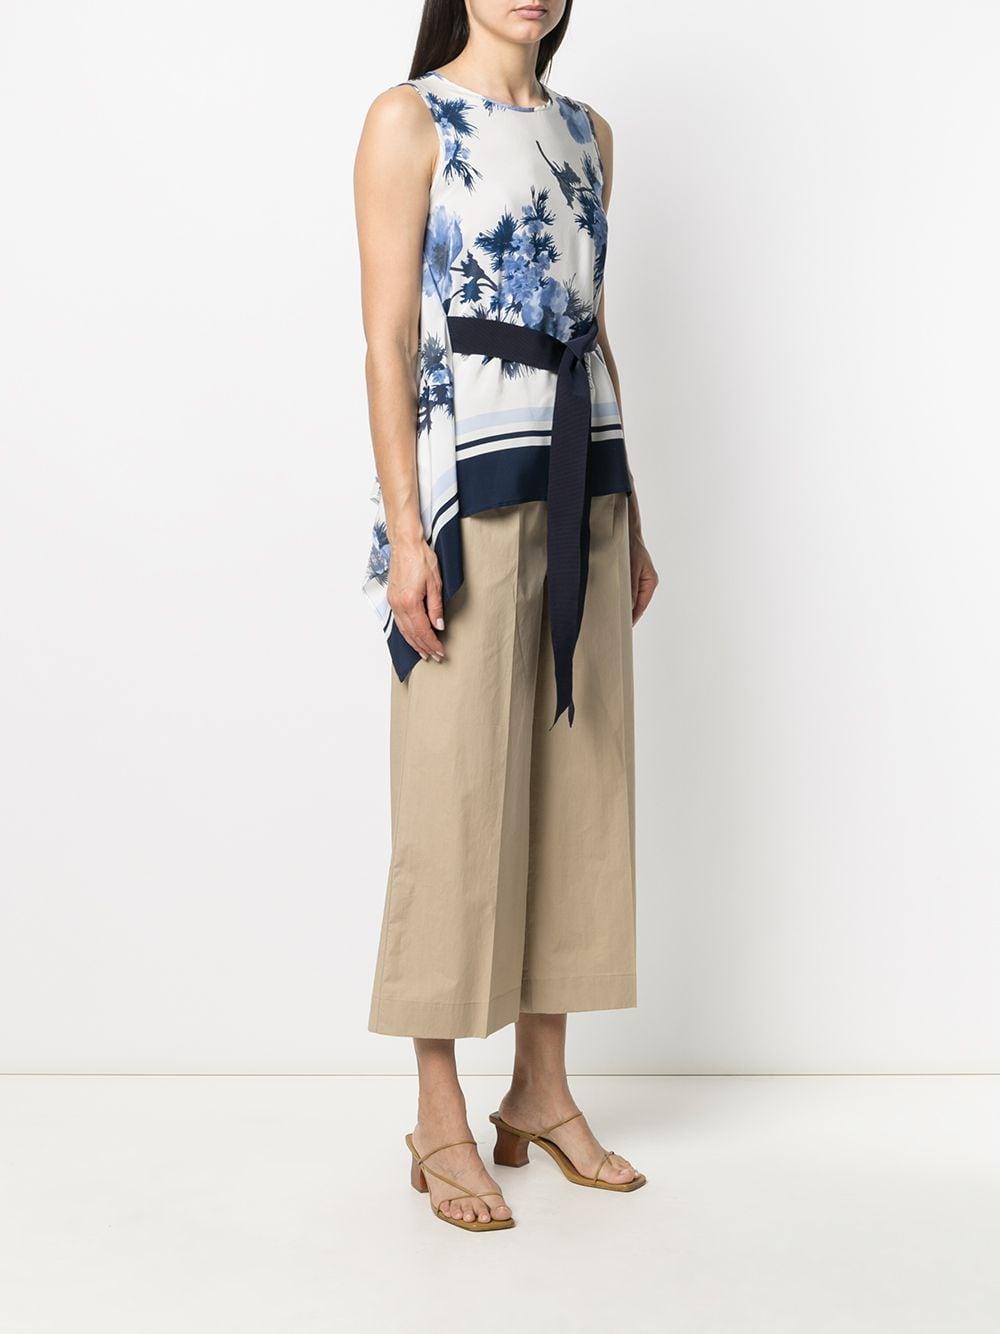 Blusa con stampa floreale in seta bianca e blu navy P.A.R.O.S.H. | Camicie | D312216-SEBLU812